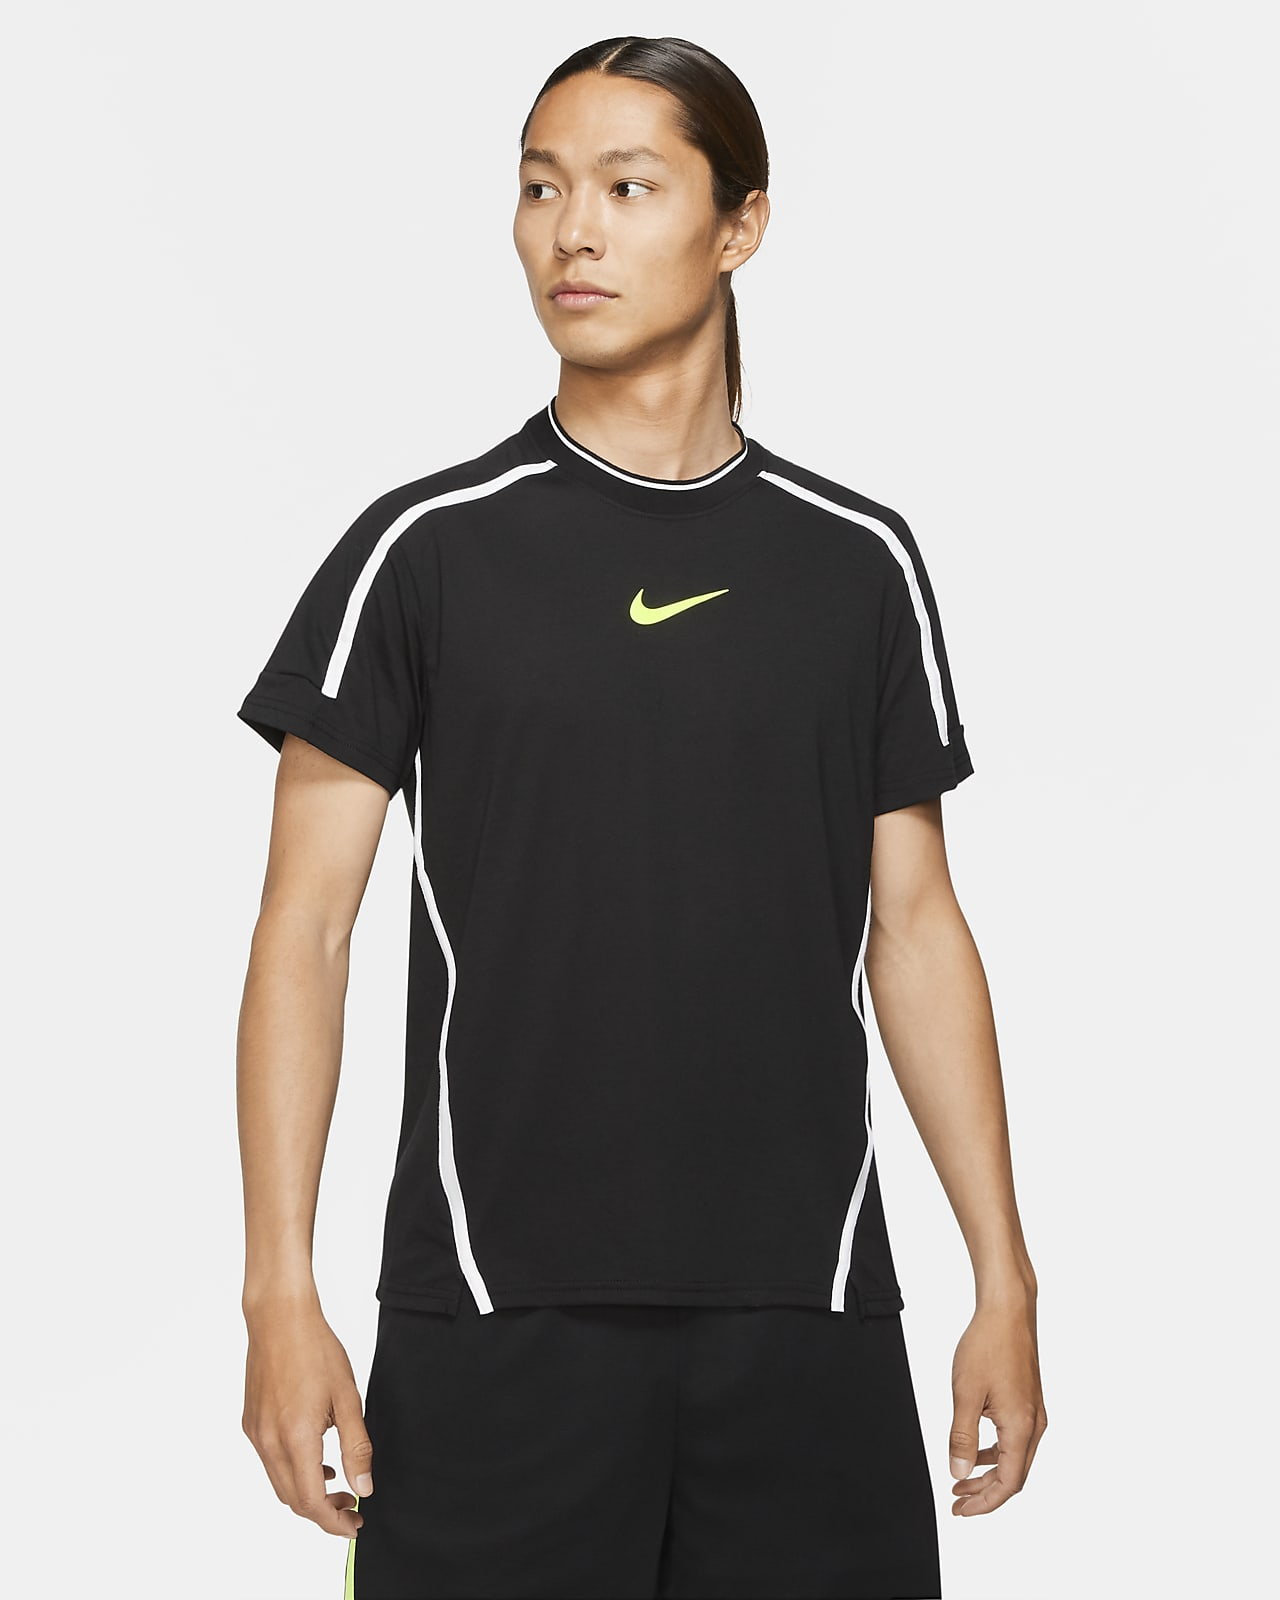 Nike Dri-FIT Sport Clash Men's Short-Sleeve Training Top